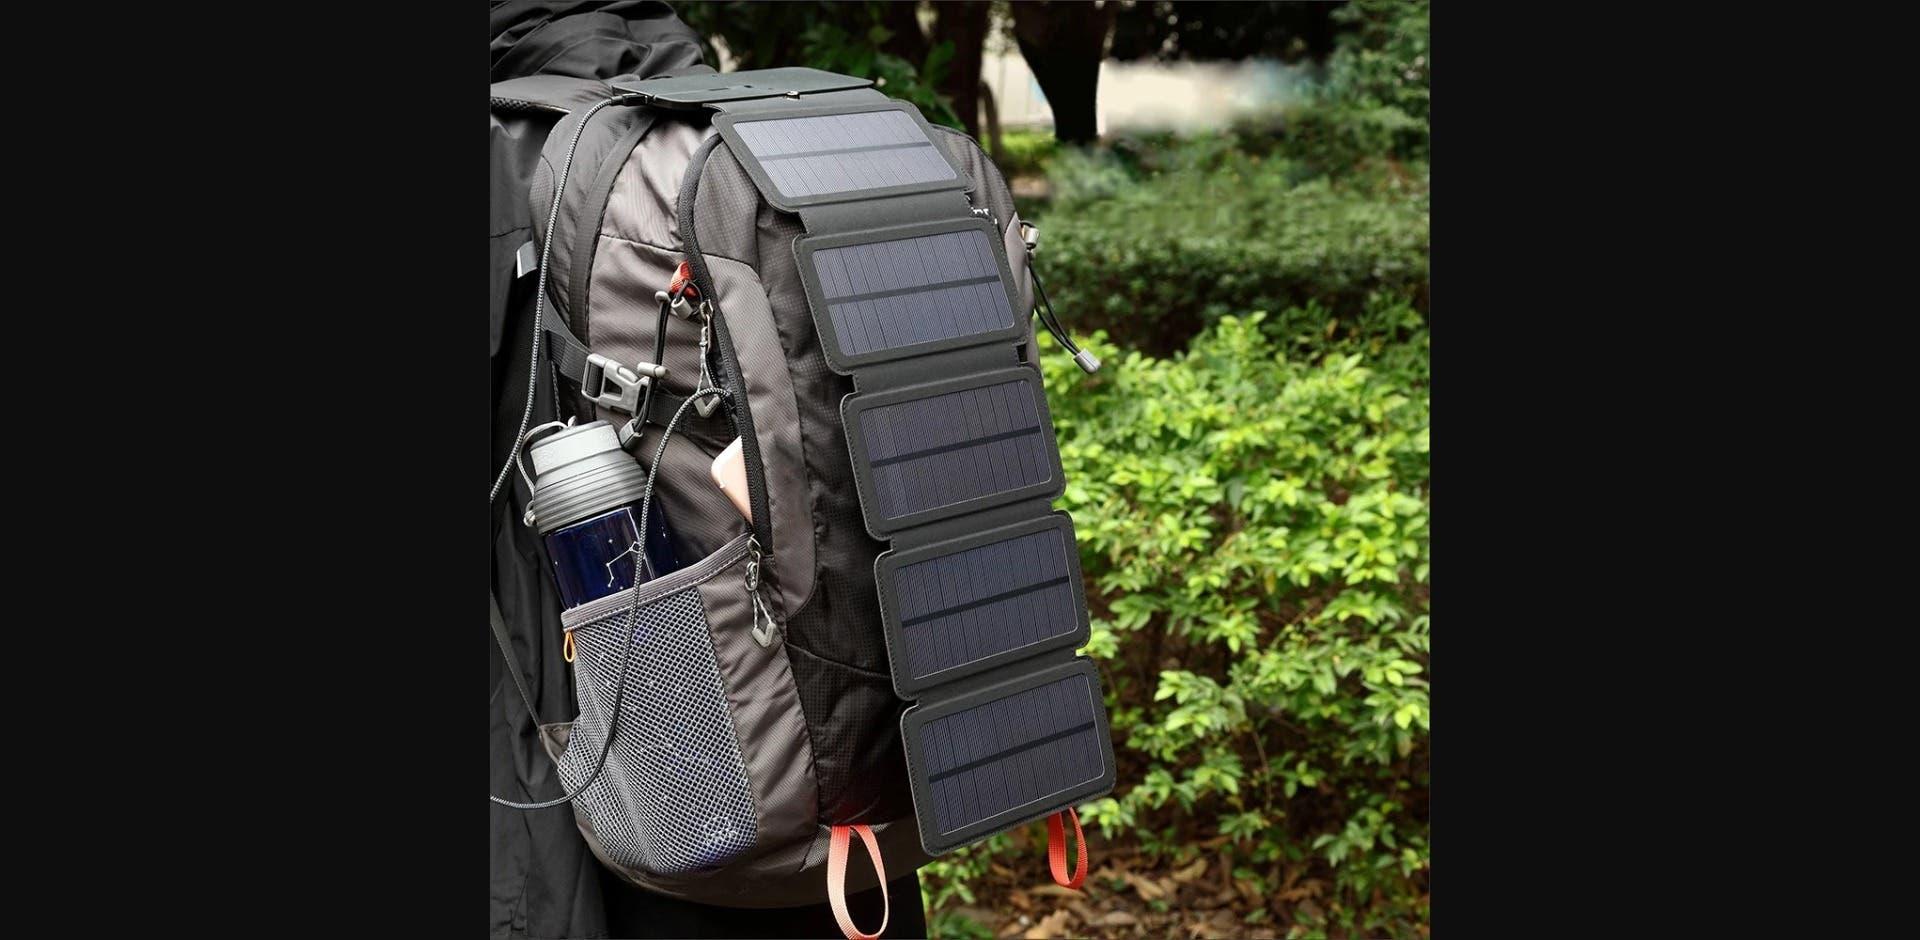 Five Solar Panel Mobile Folding Bags